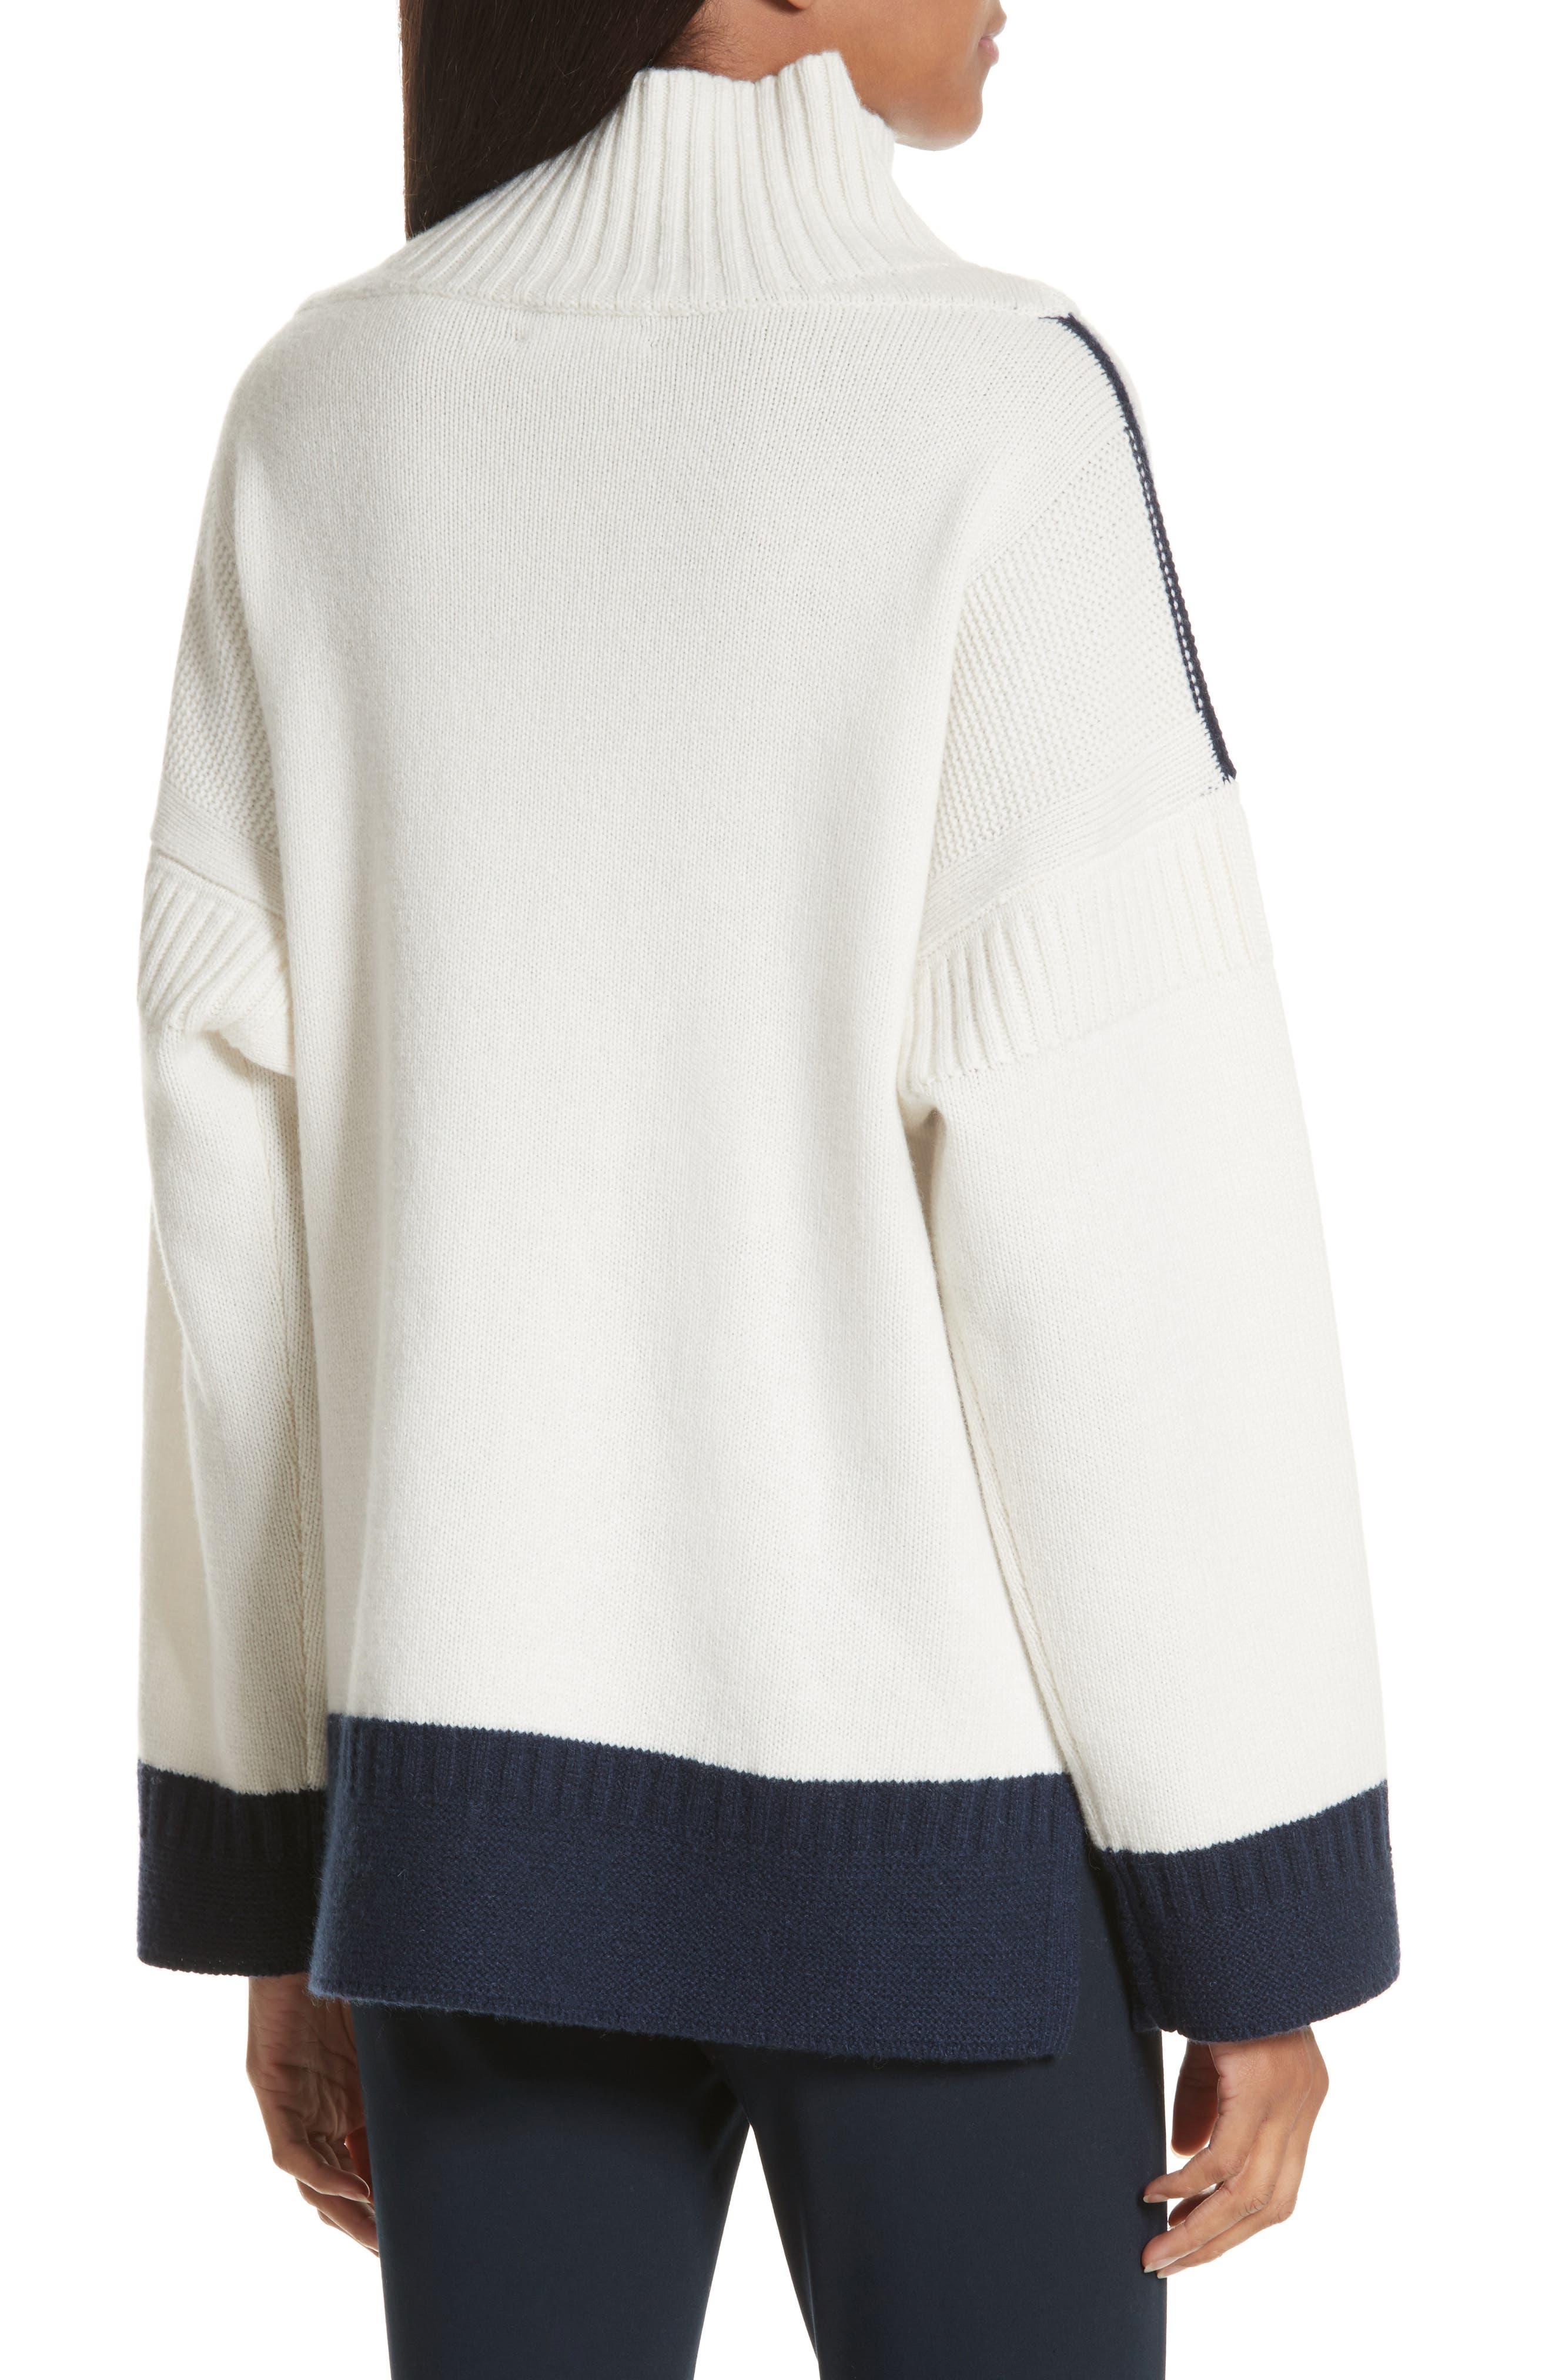 Aubree Funnel Neck Cashmere Sweater,                             Alternate thumbnail 2, color,                             908